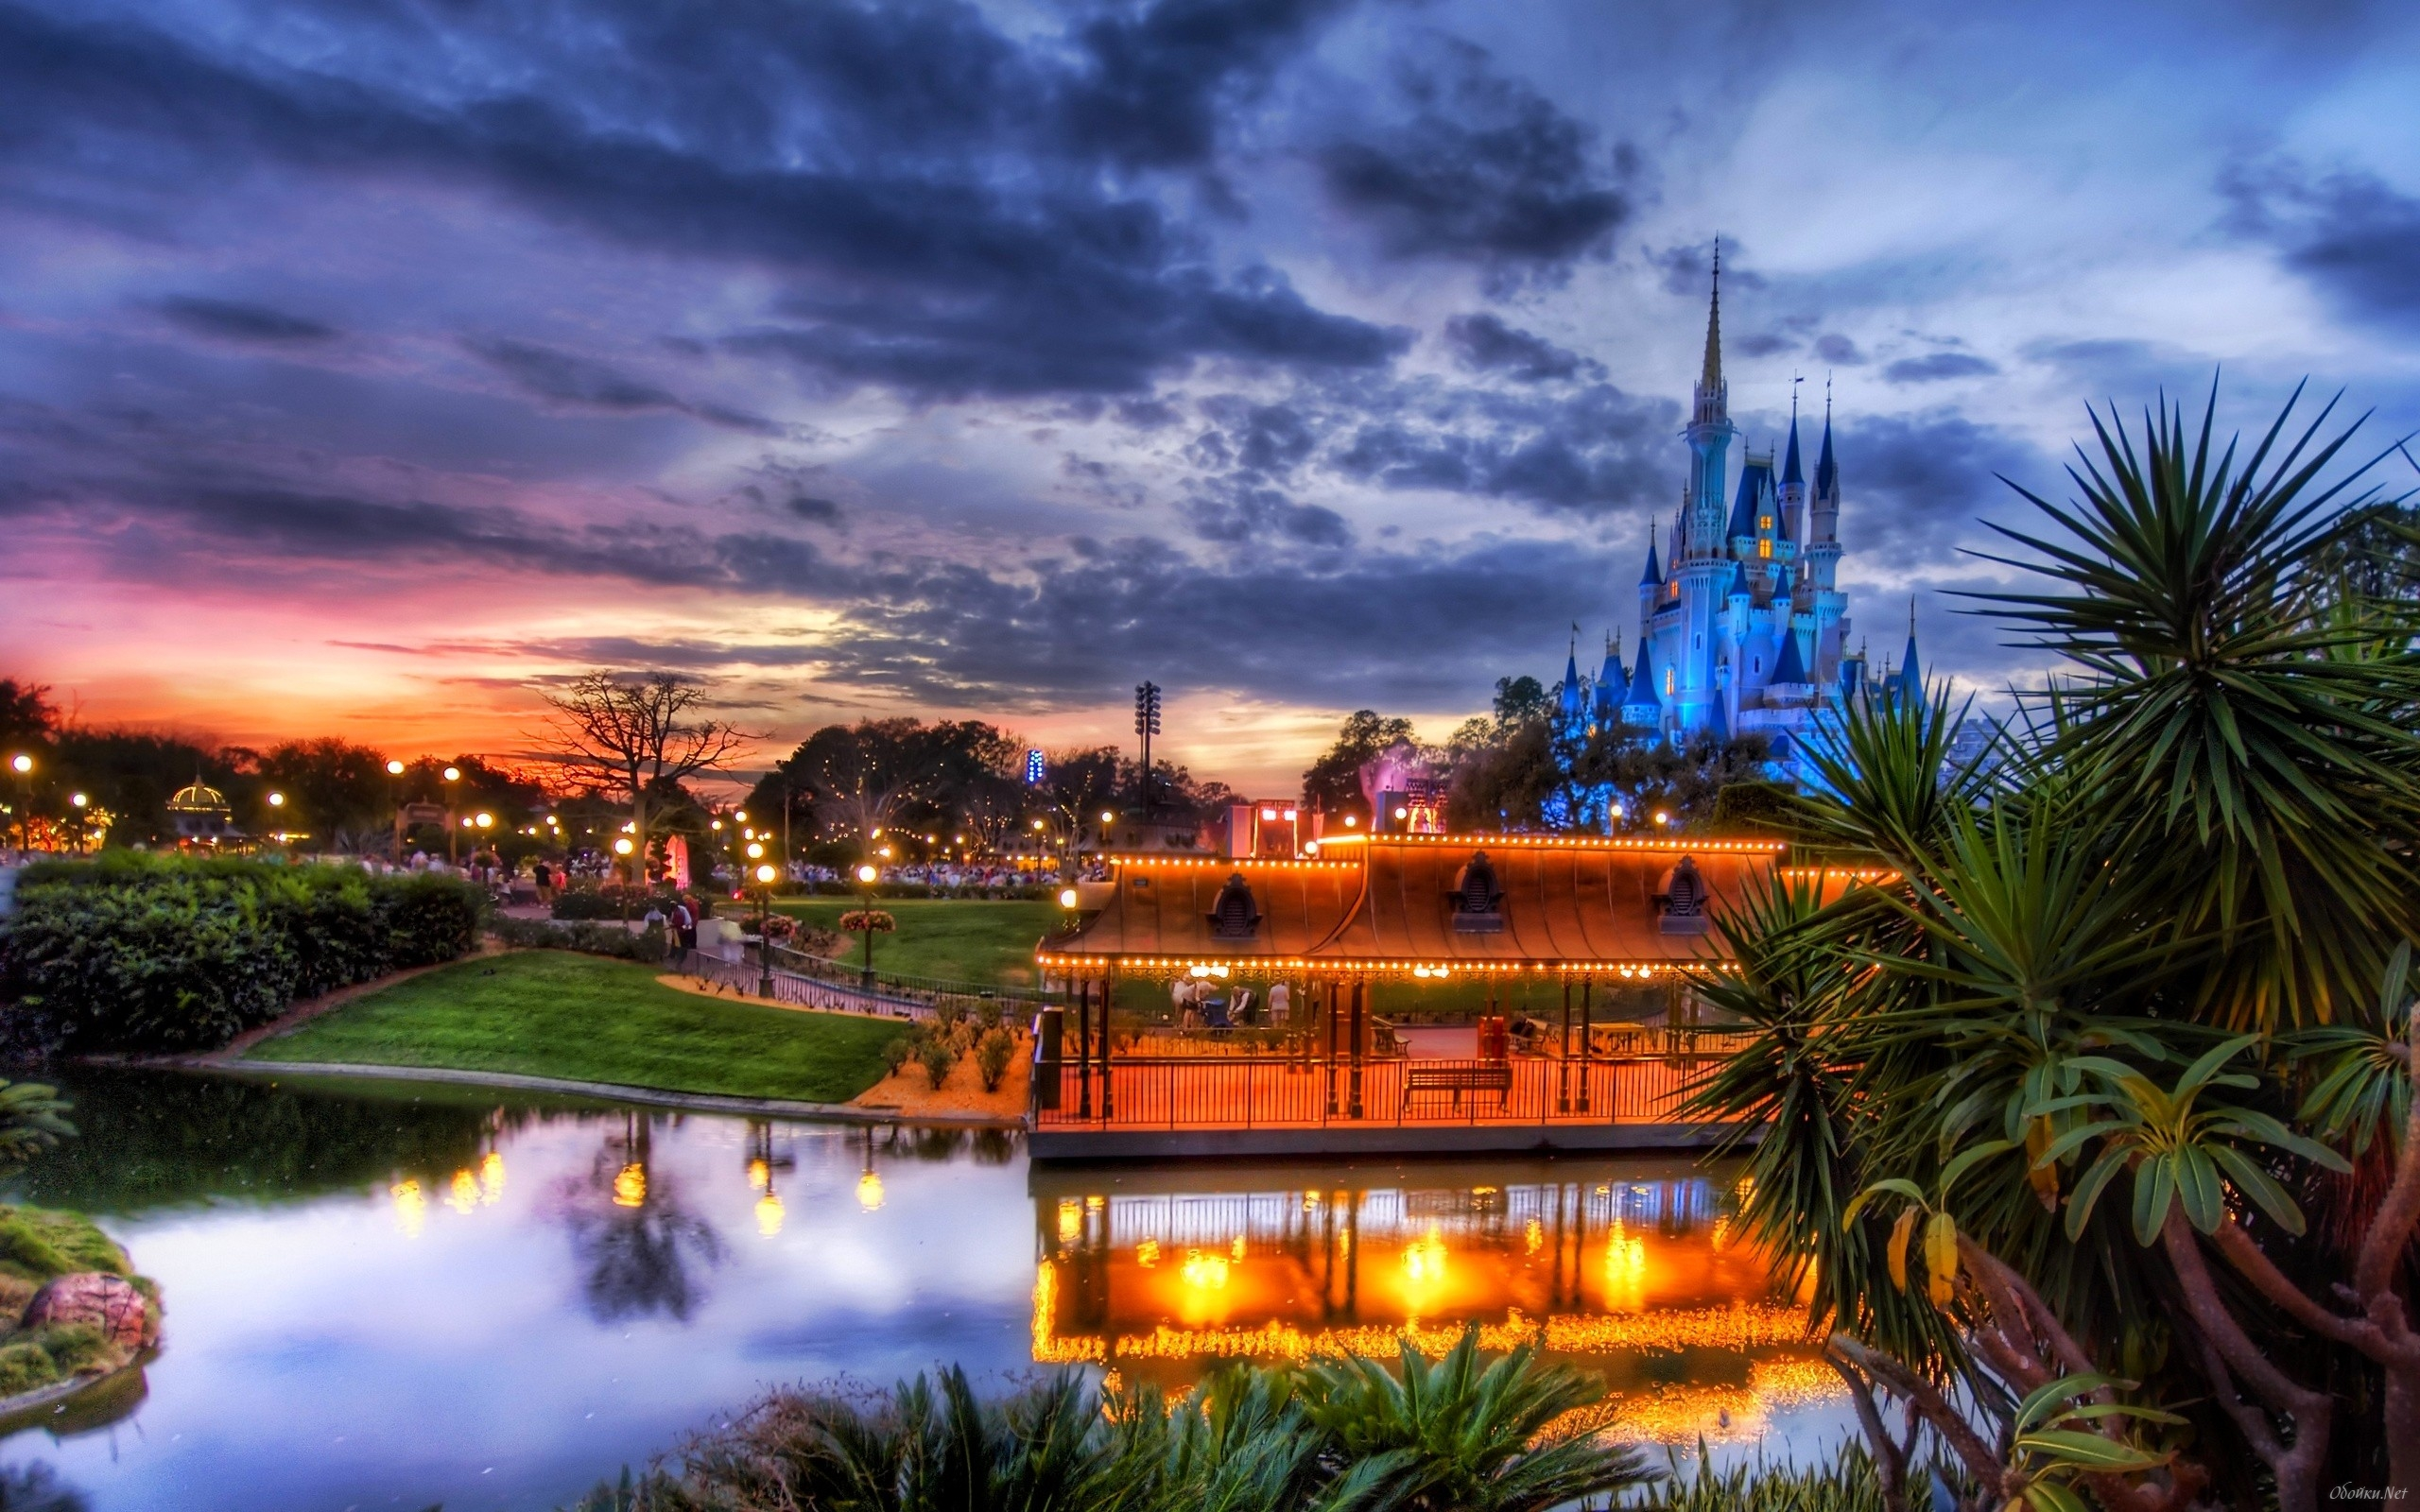 Disney town HD Desktop Wallpaper HD Desktop Wallpaper 2560x1600